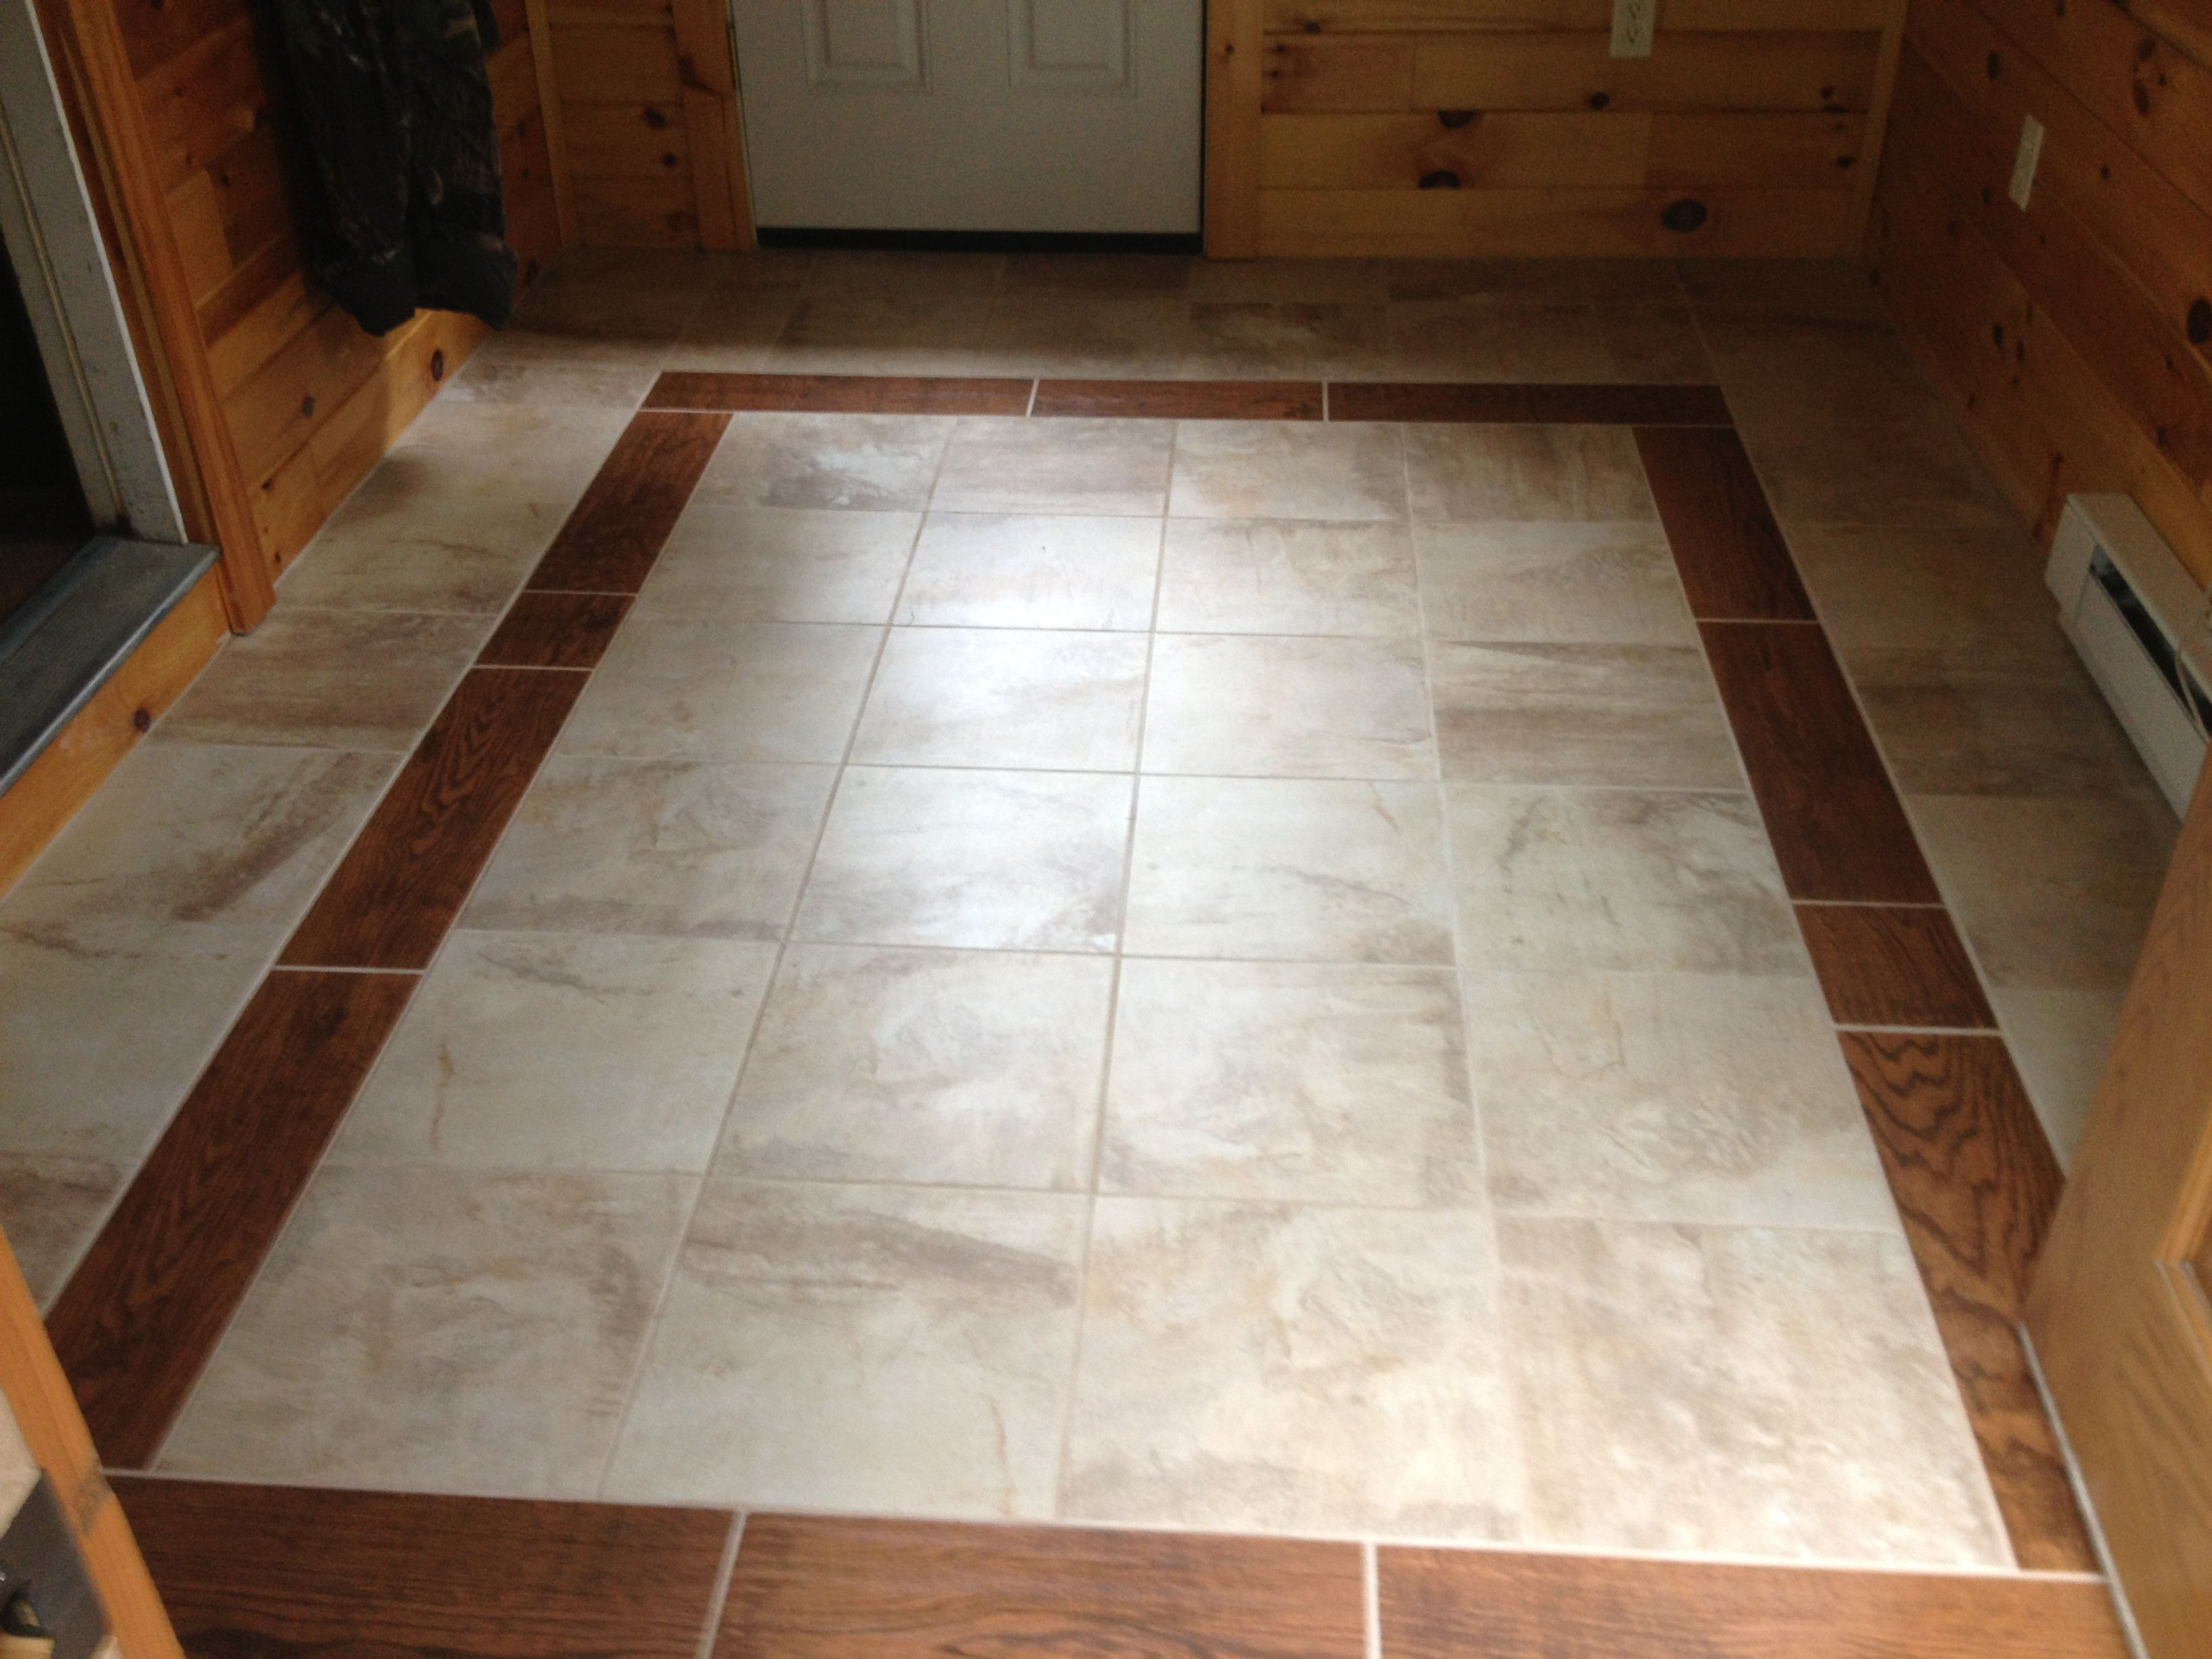 Mud Room Floor Wood Tile Border Tile Floor Flooring Floor